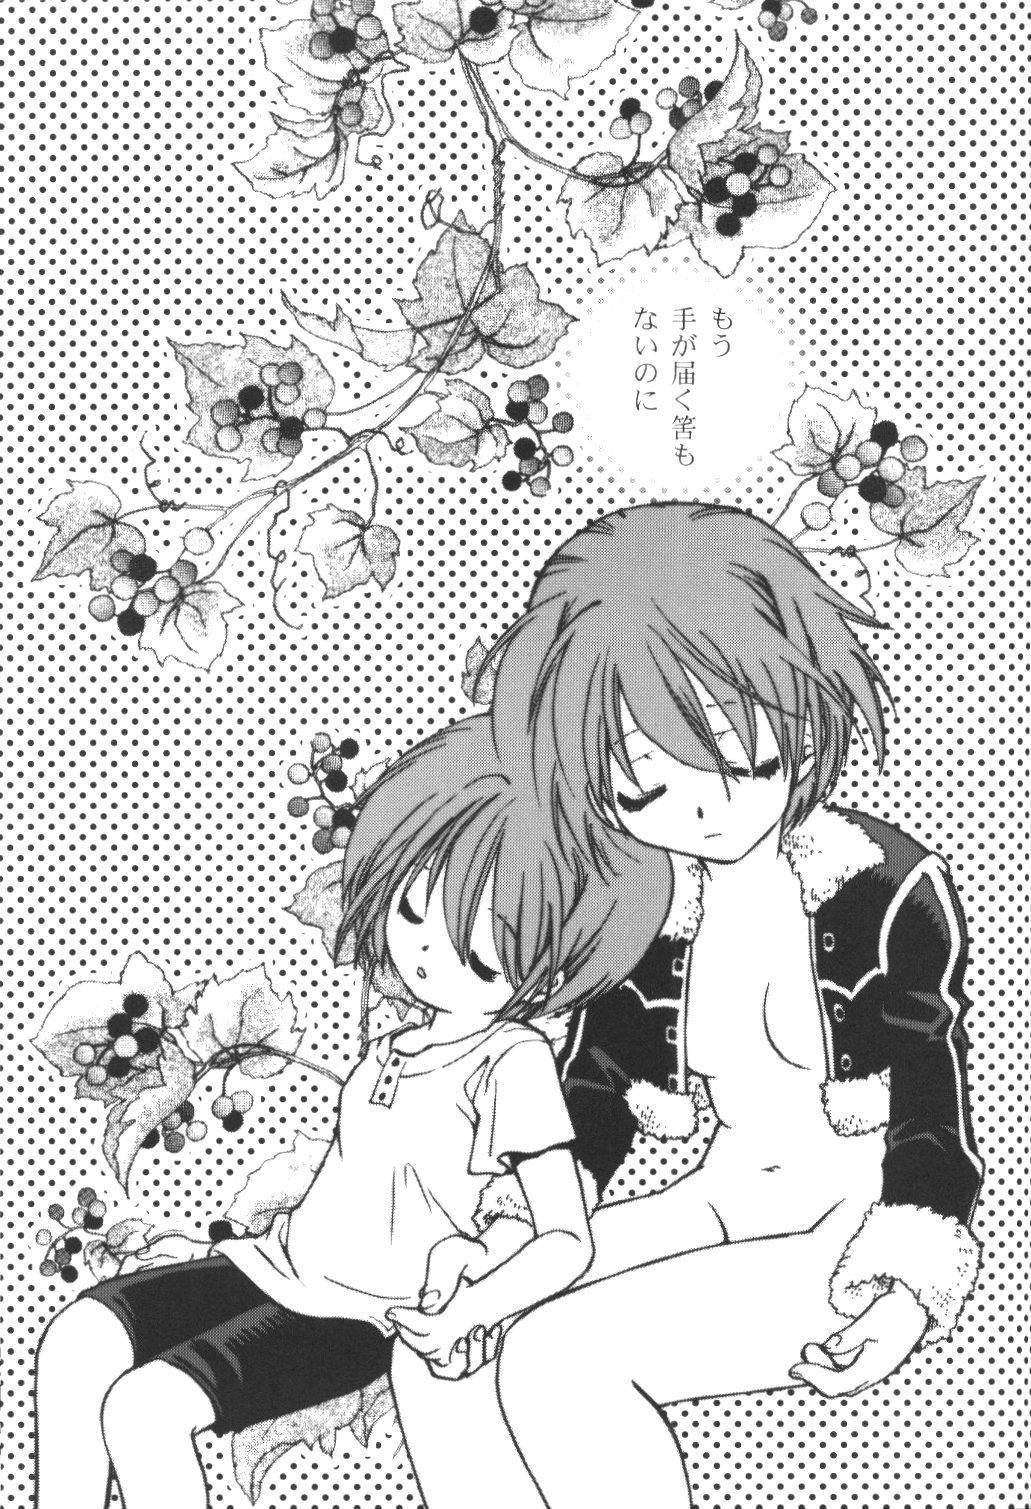 Saboten Girl Zoro x Tashigi 21